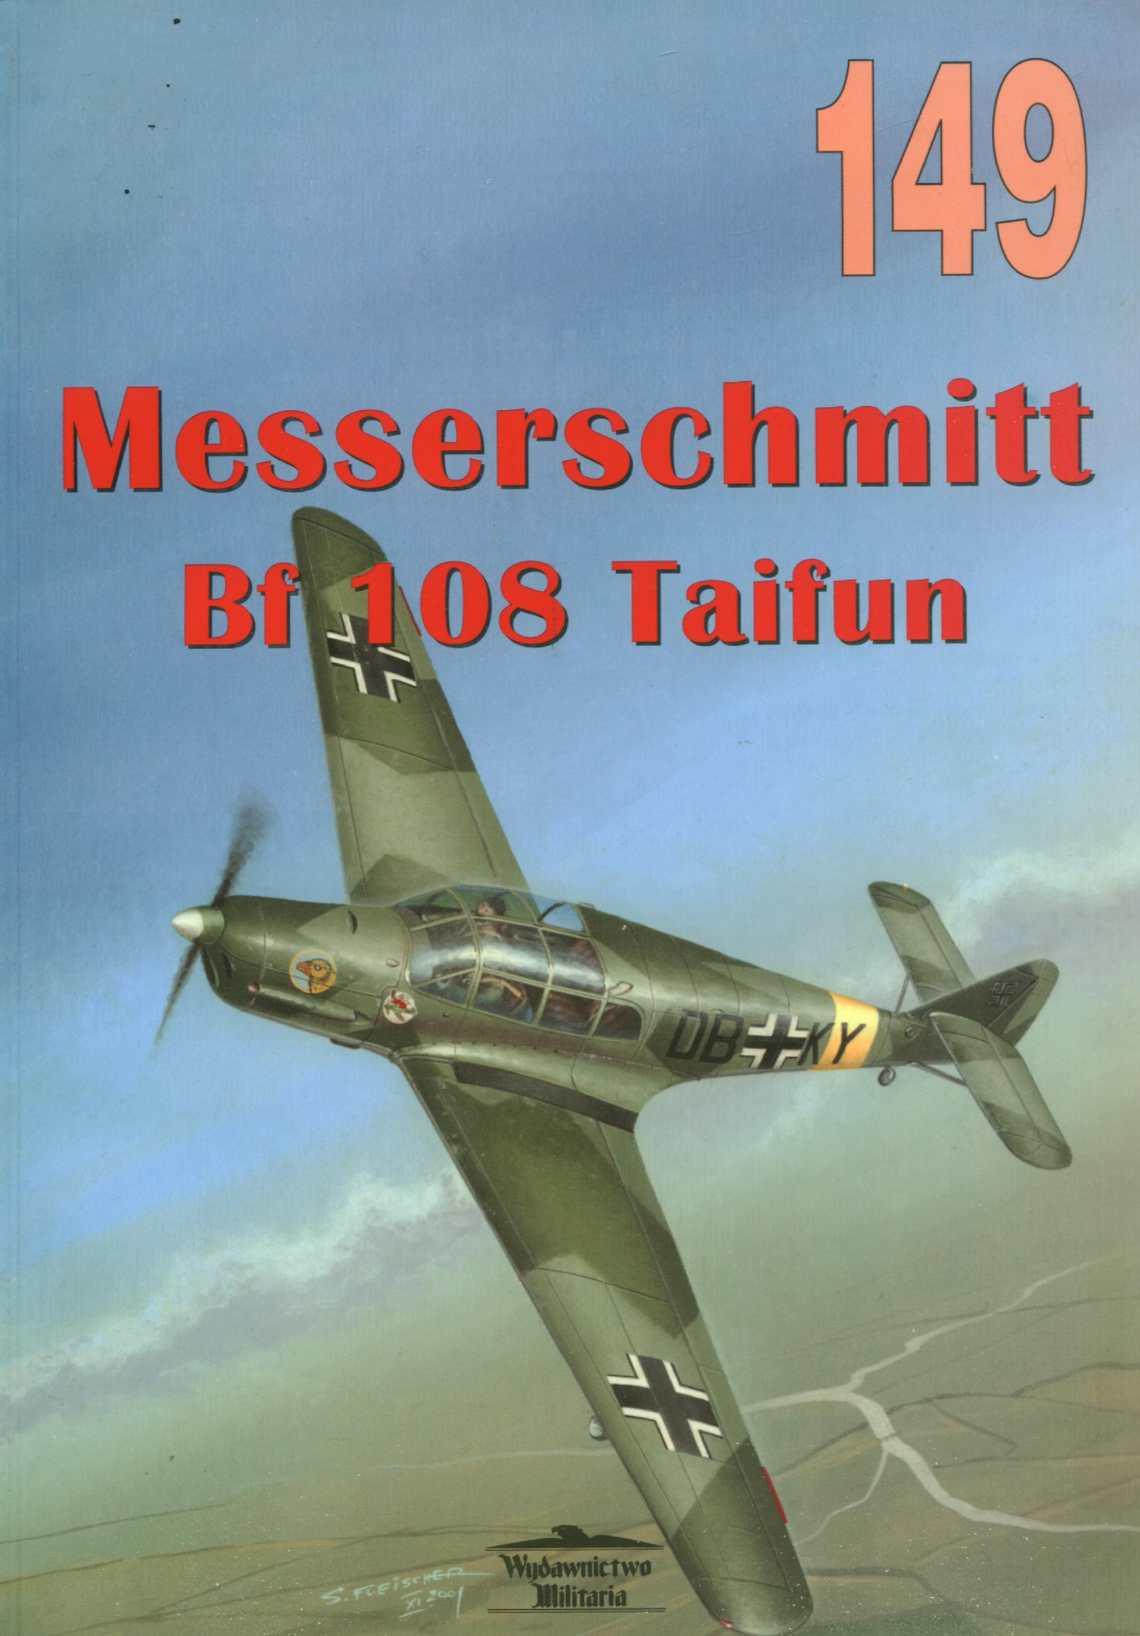 Wydawnictwo Militaria 149 Messerschmitt Bf-108 Taifun.pdf